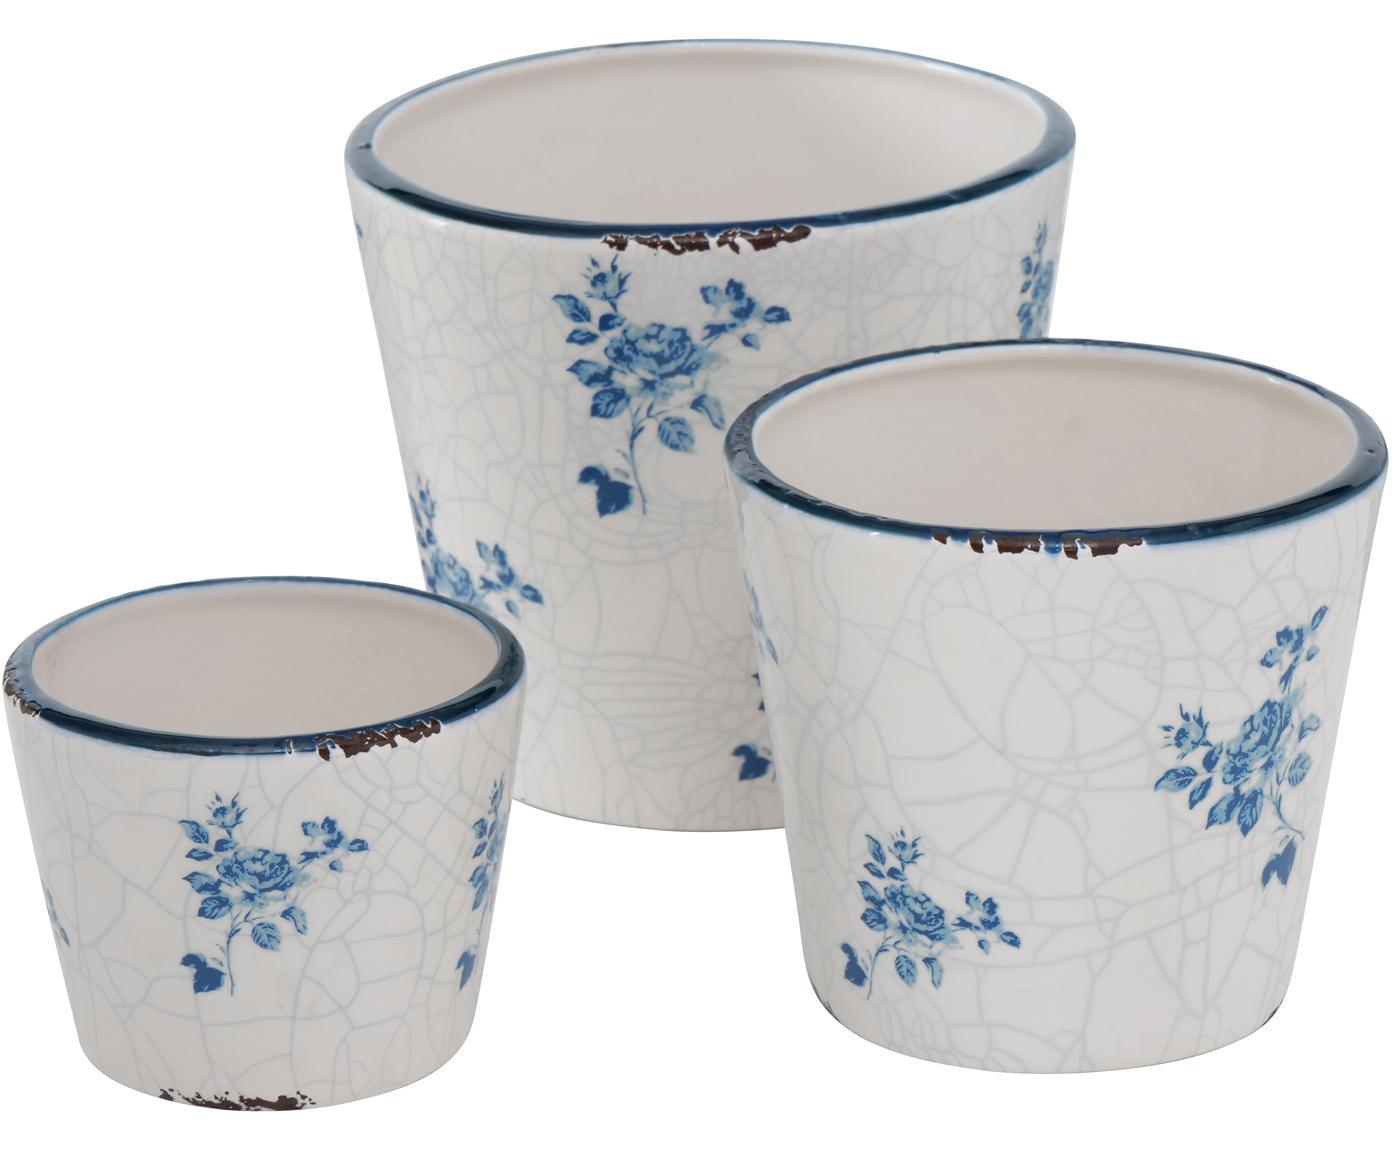 Set 3 portavasi in terracotta Marie, Terracotta, Bianco, Diverse dimensioni